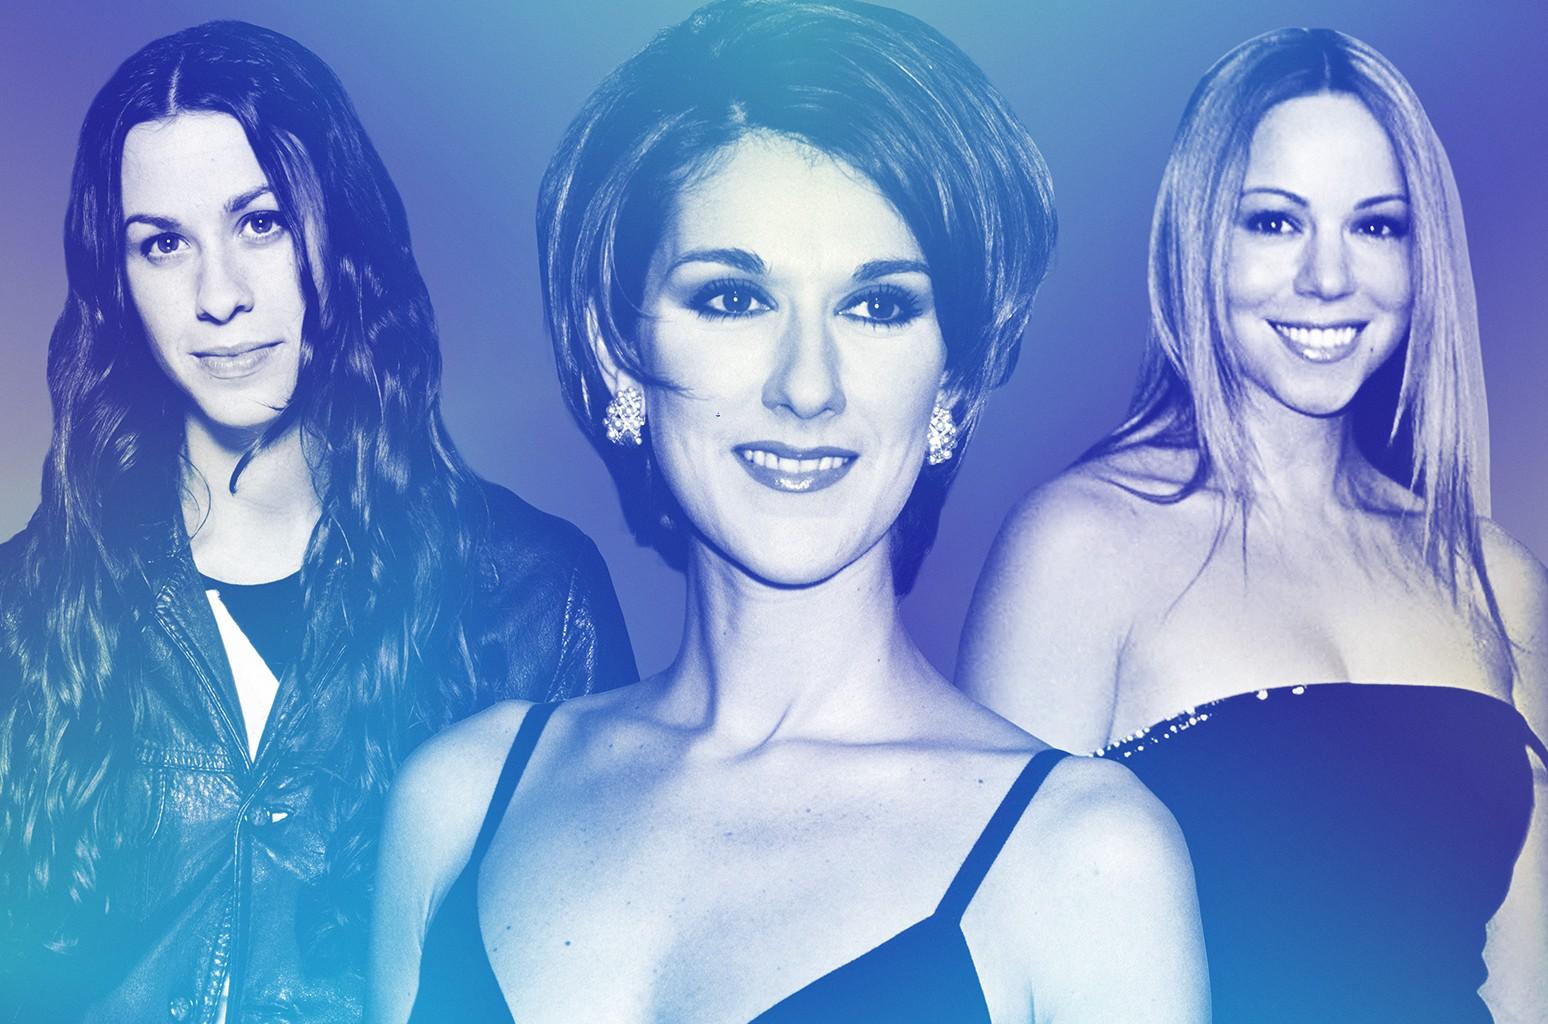 From left: Alanis Morissette, Celine Dion & Mariah Carey